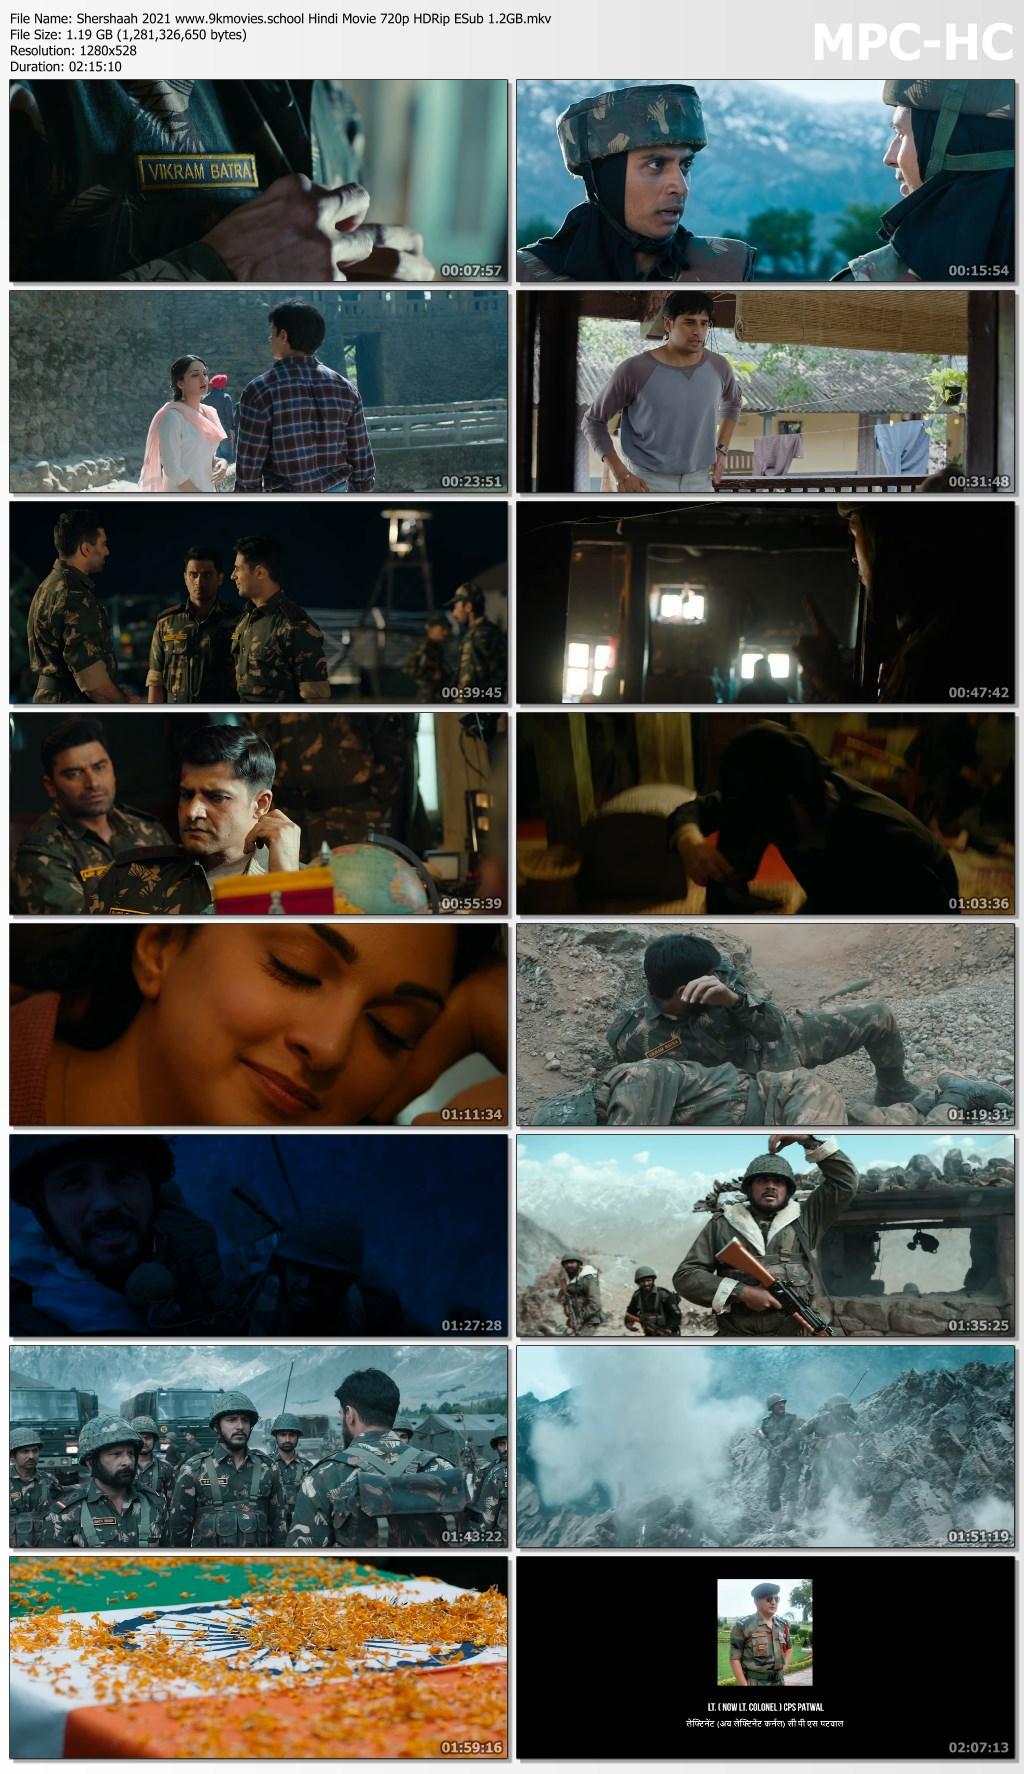 Shershaah 2021 screenshot HDMoviesFair